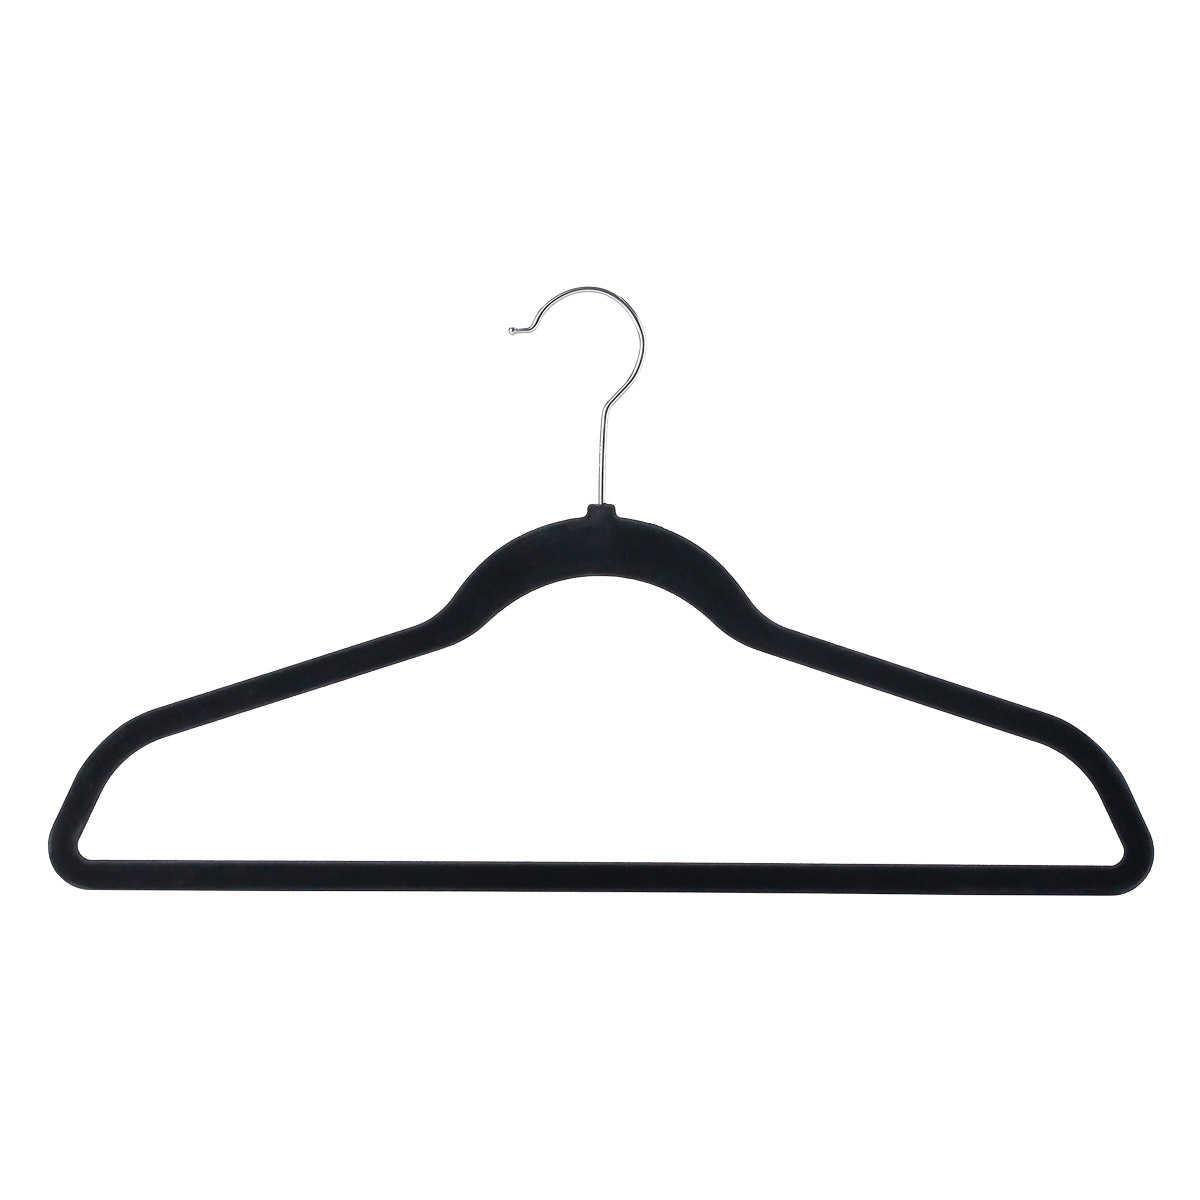 wooden clothes hangers costco